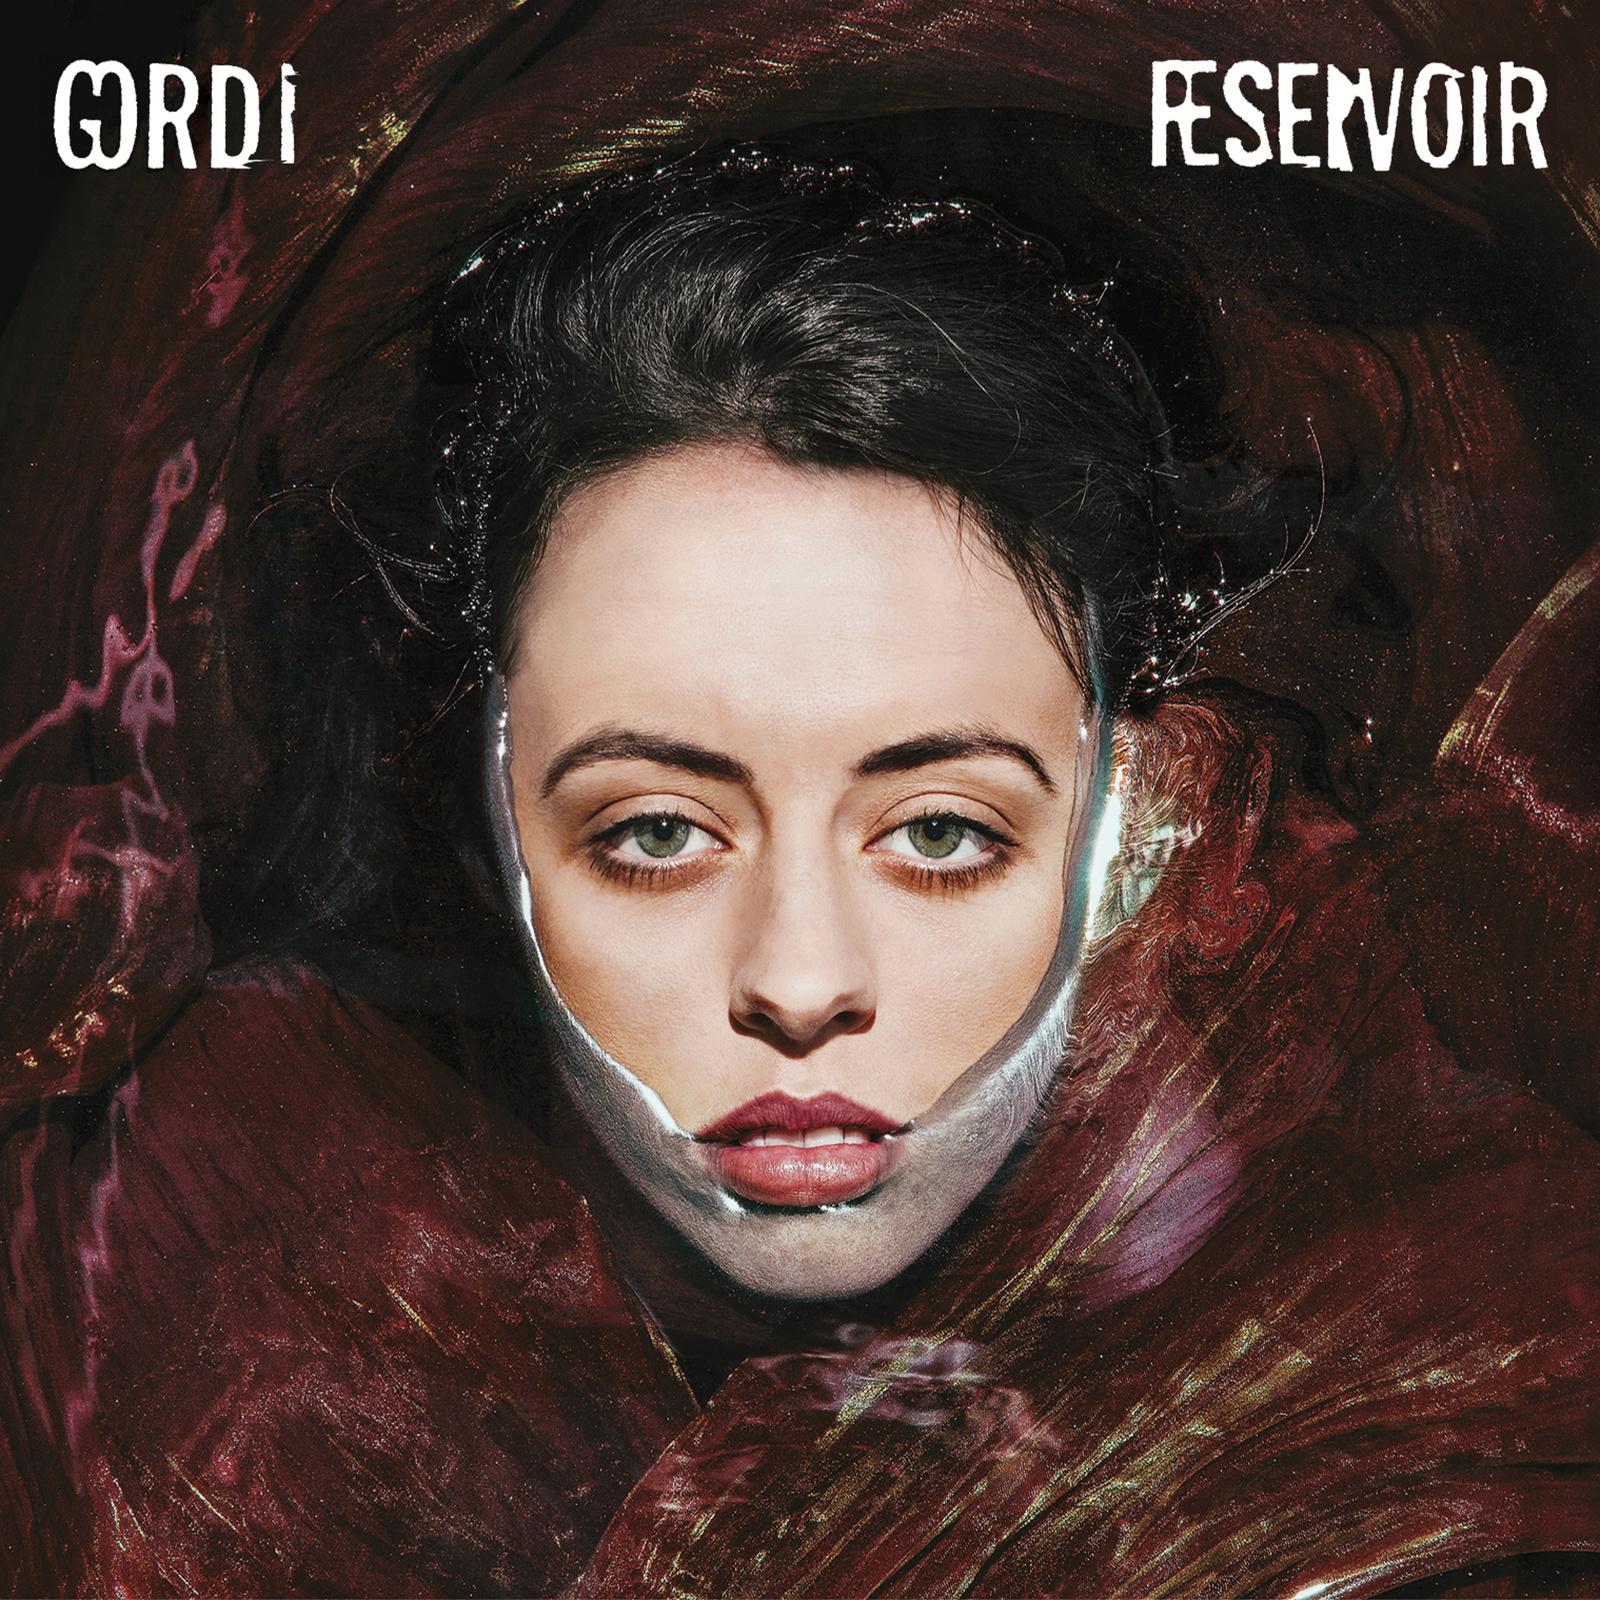 Reservoir by Gordi image